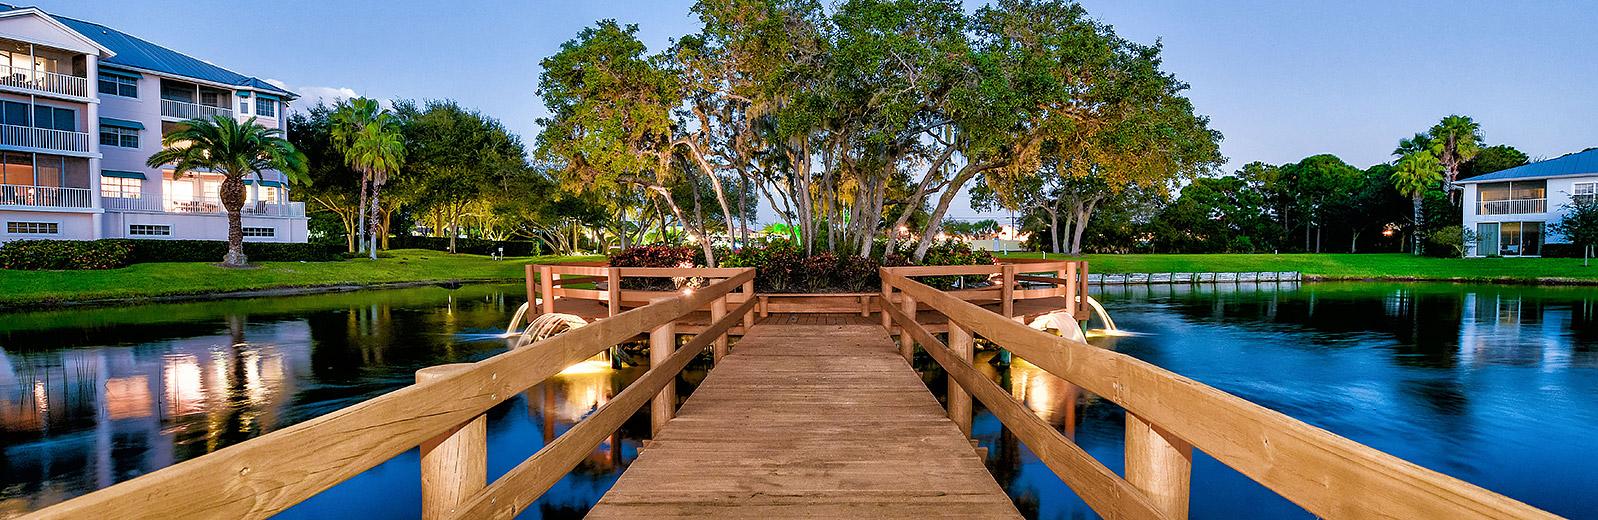 EdgewaterHB-deck-pond.jpg